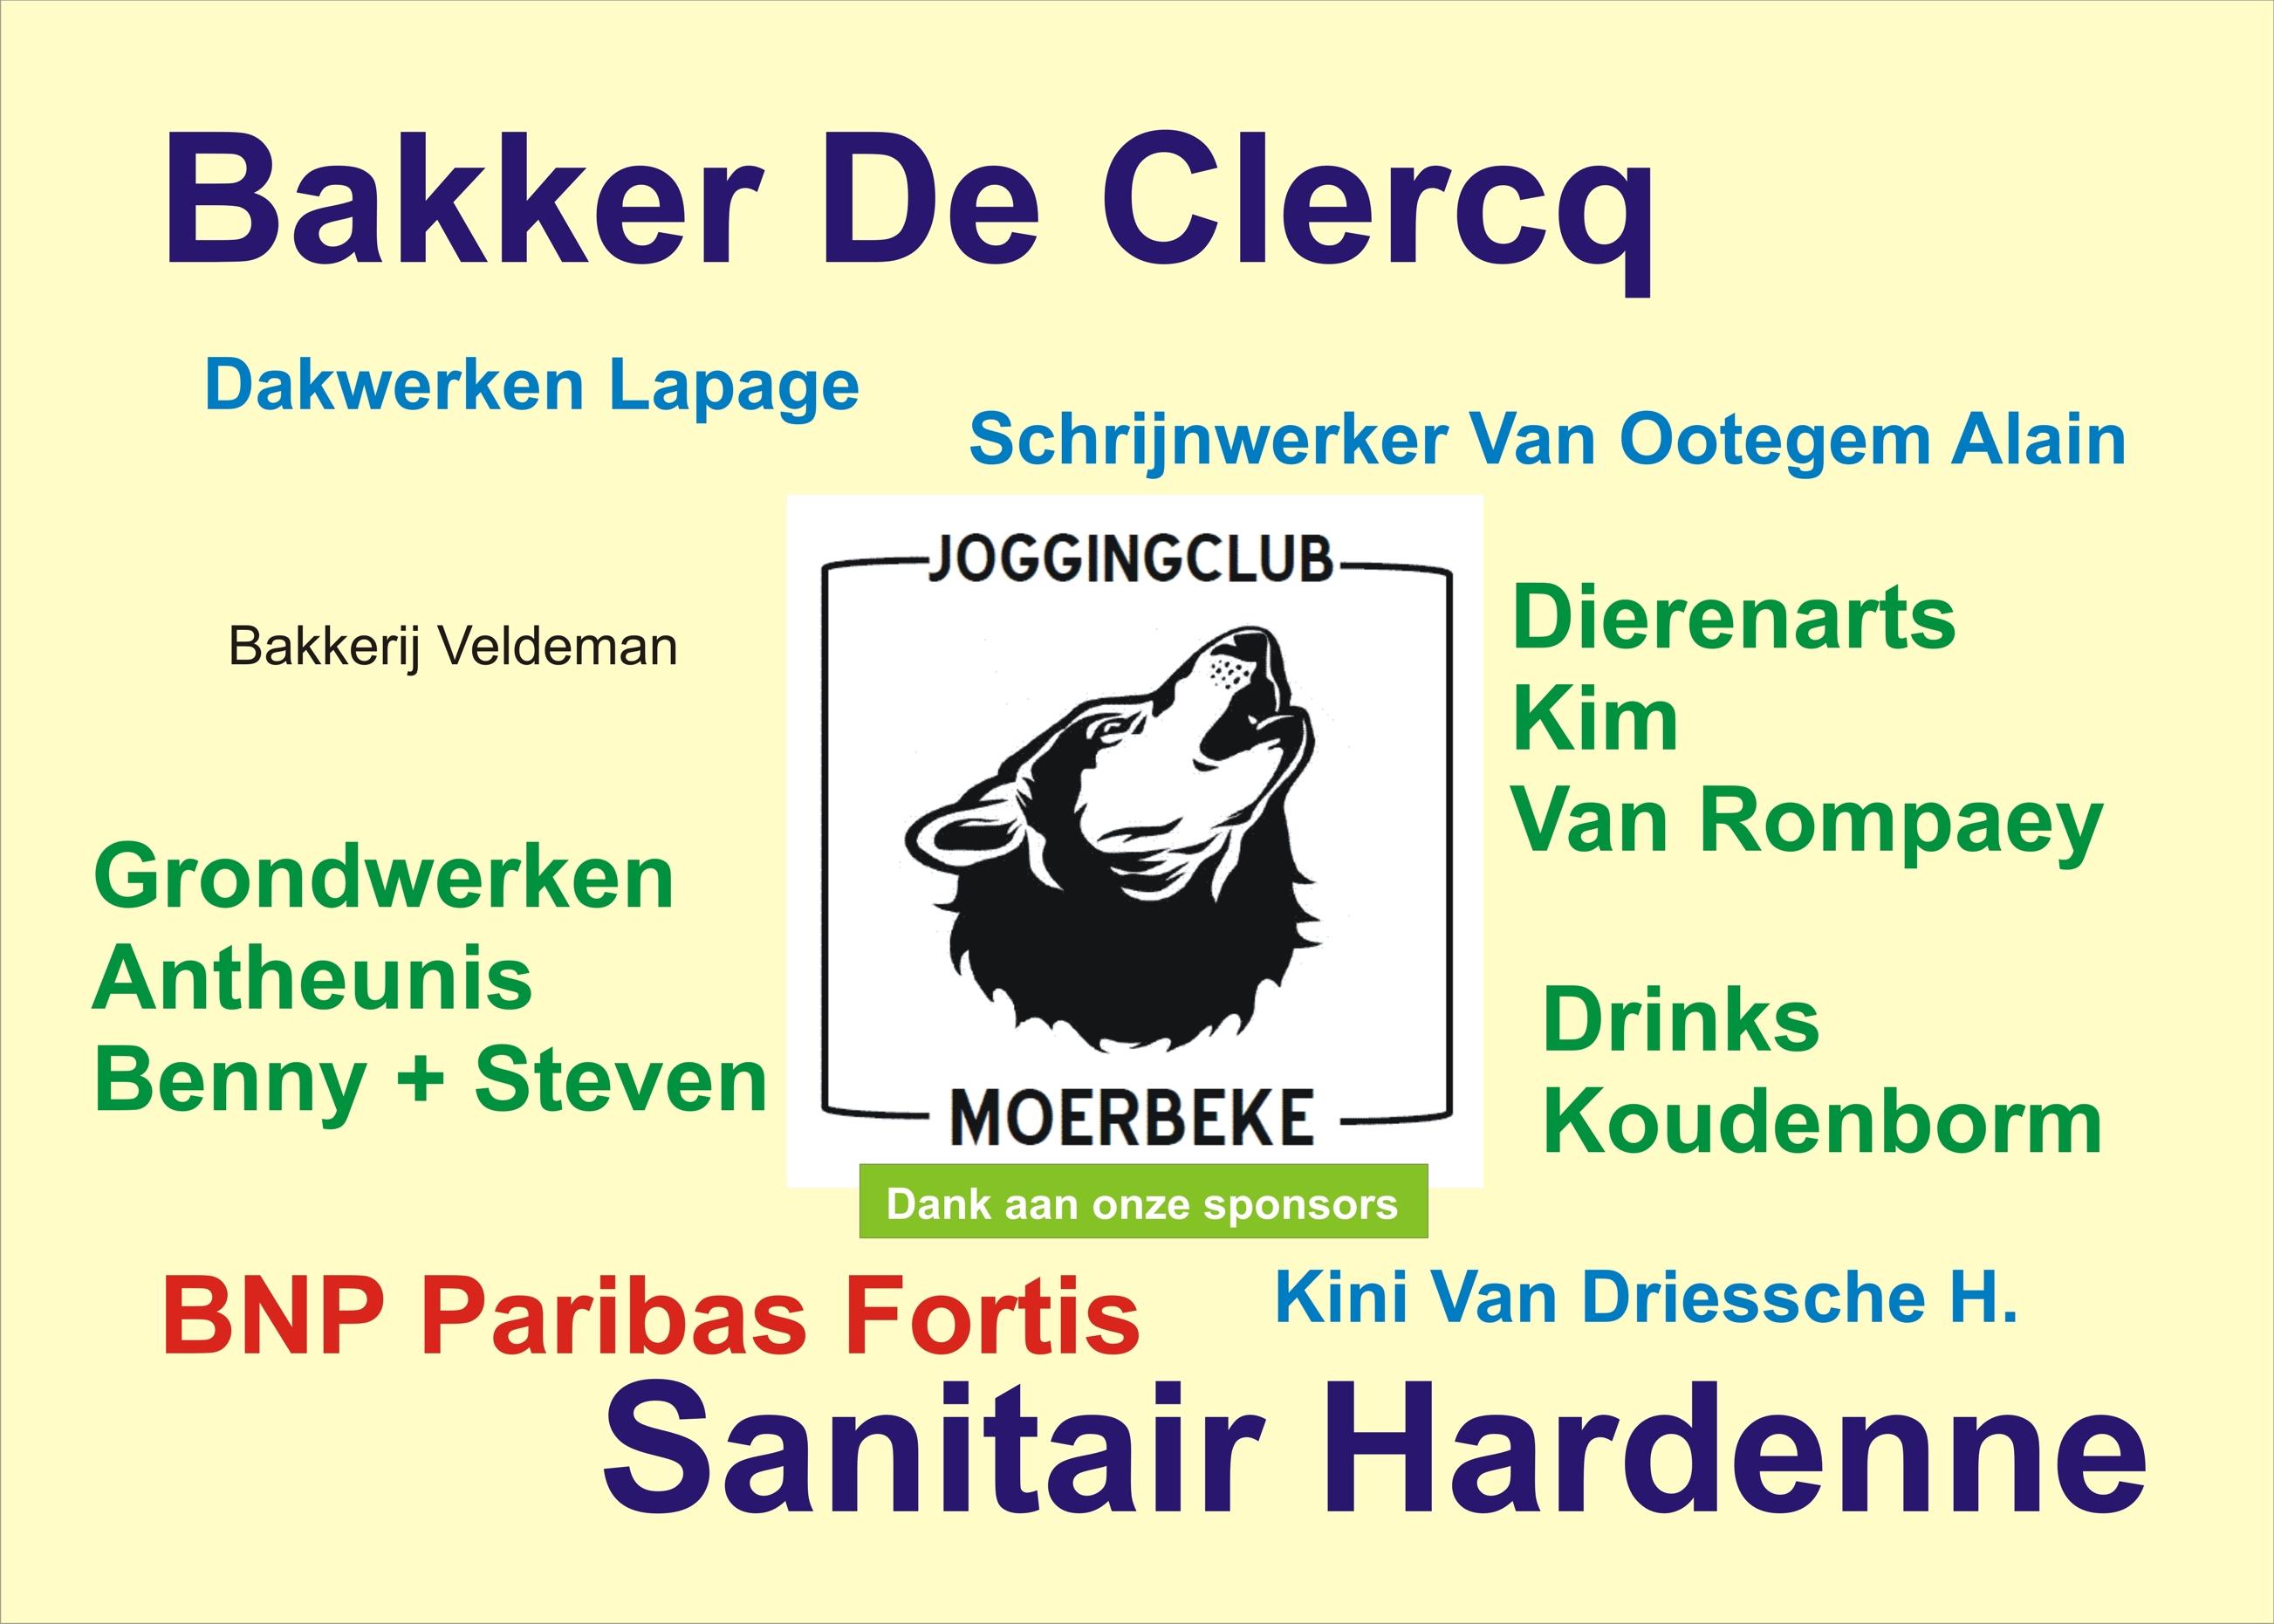 http://www.joggingclubmoerbeke.be/2014/mhl/mhlspons02.jpg